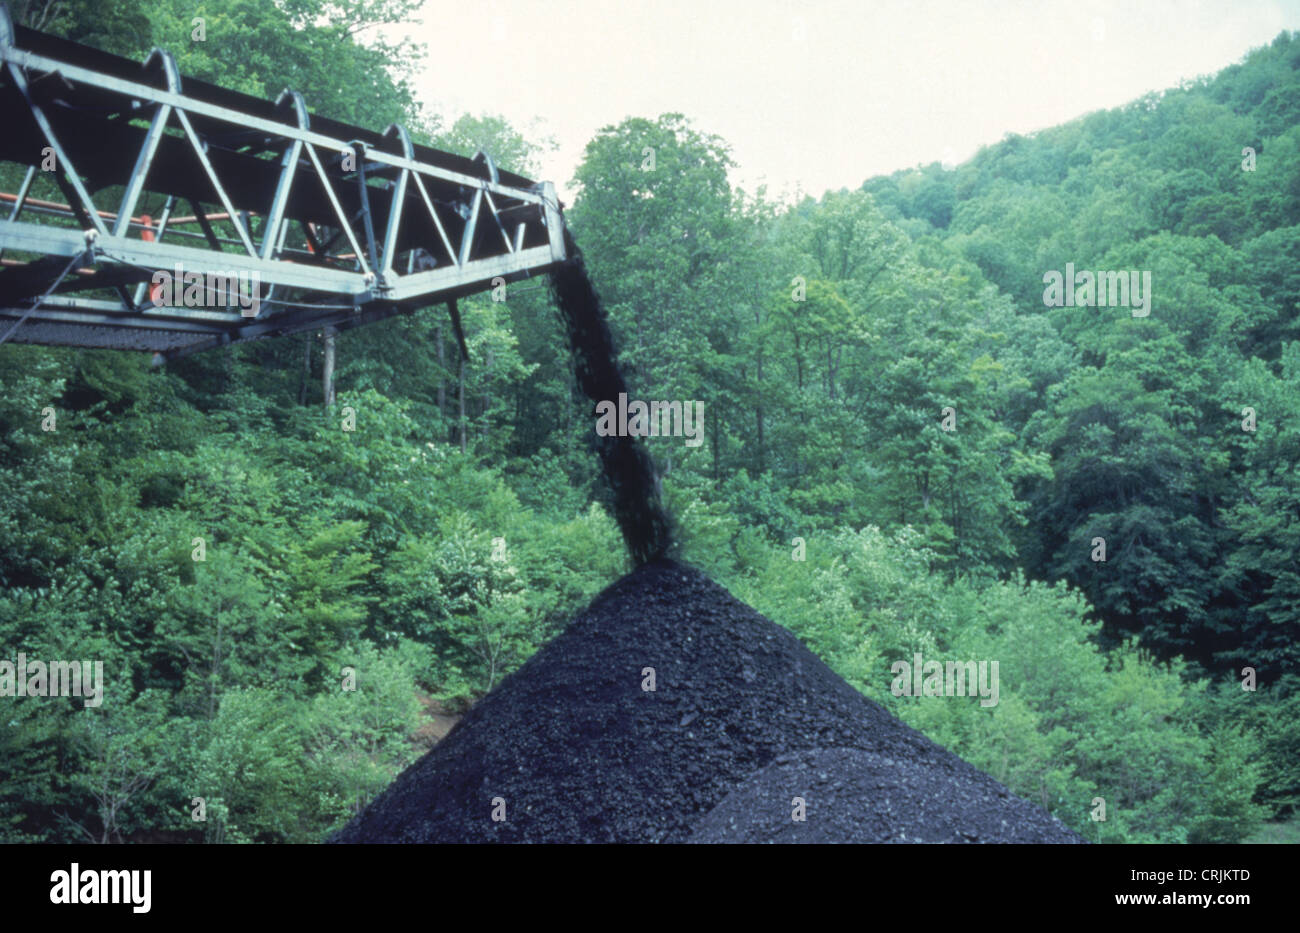 Coal mining conveyor belt and coal pile in West Virginia - Stock Image